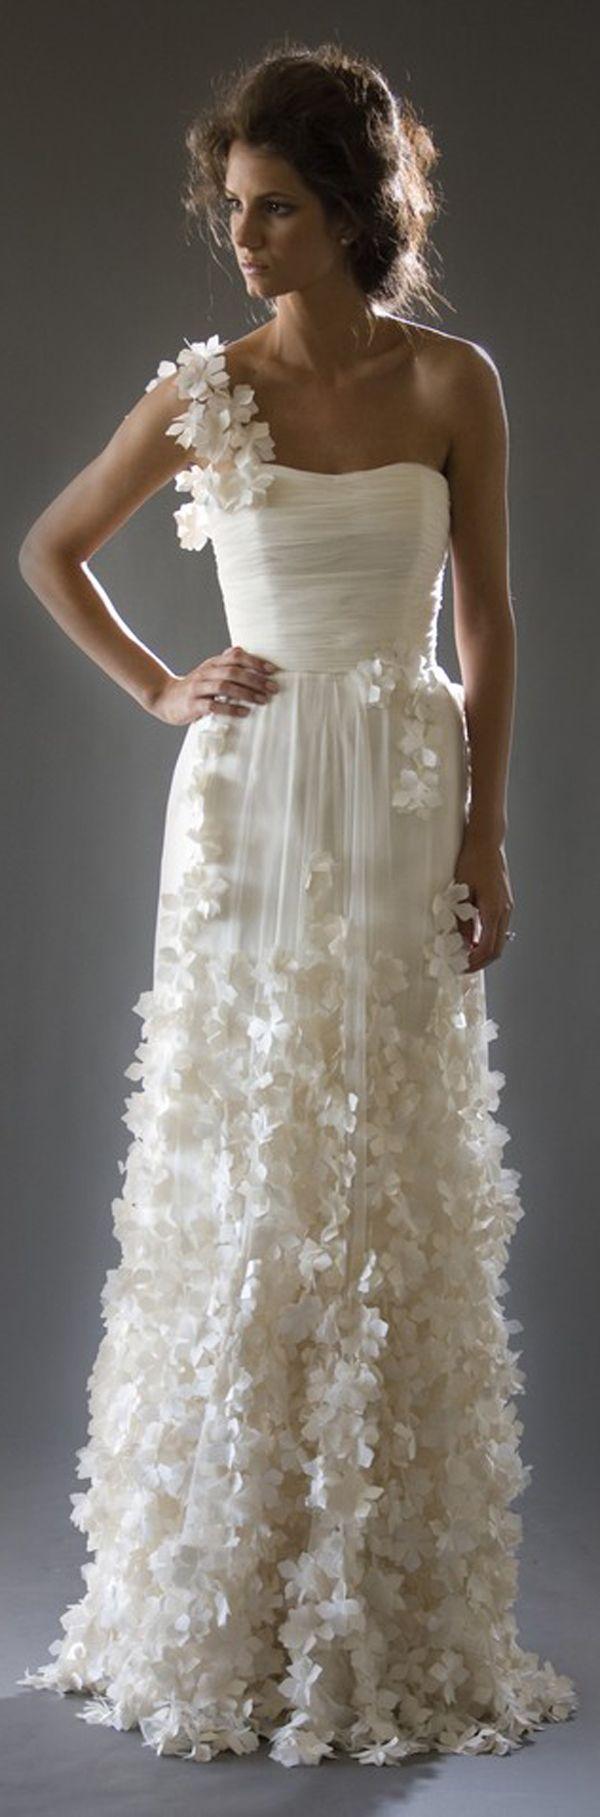 boho hippie wedding dress, Bohemian wedding, floral detail.